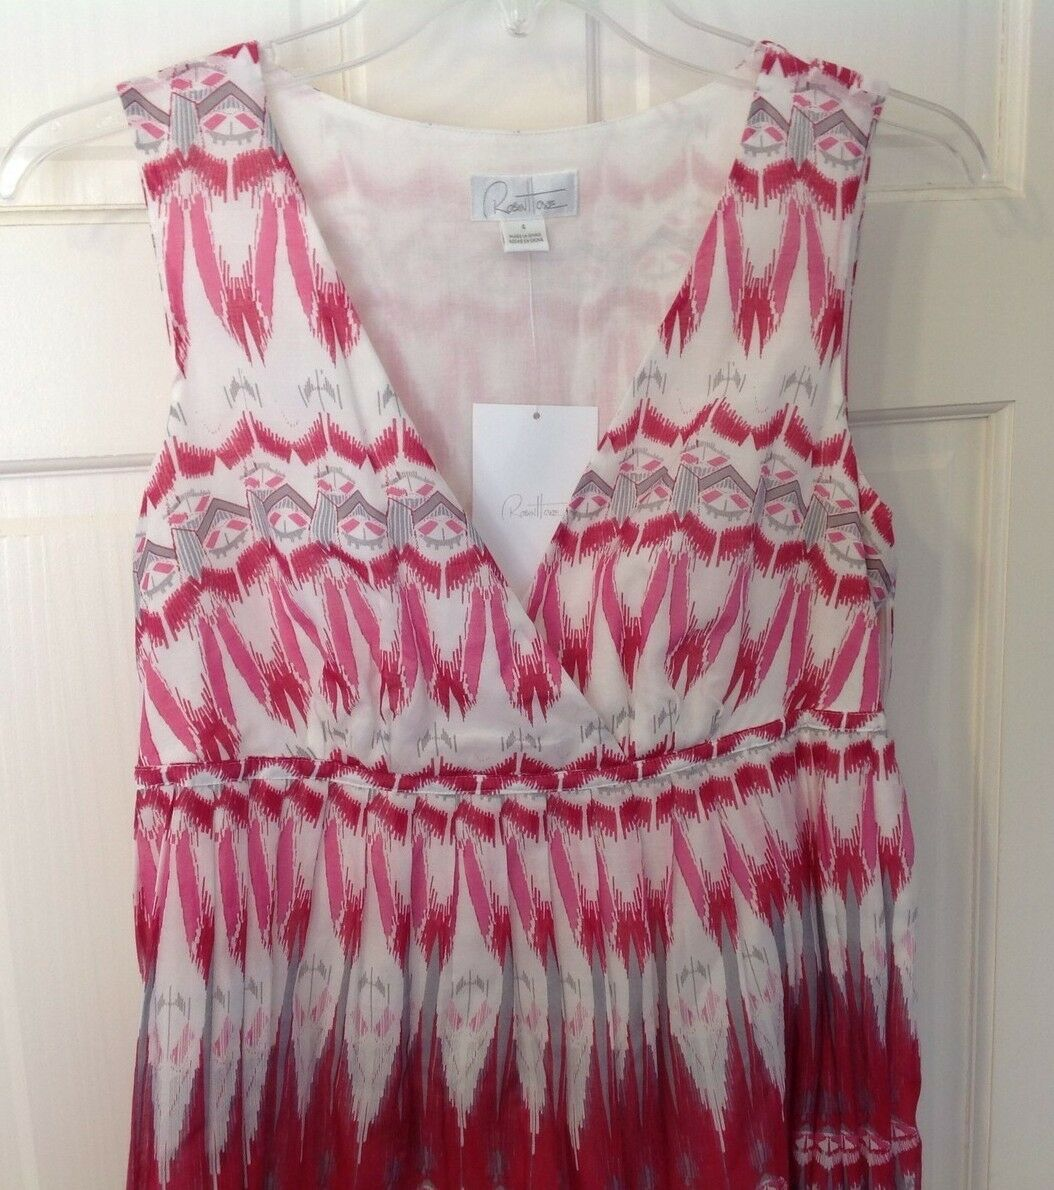 ROBIN HOWE PINK Silk Sleeveless DRESS Sz 4 NWT Brand New